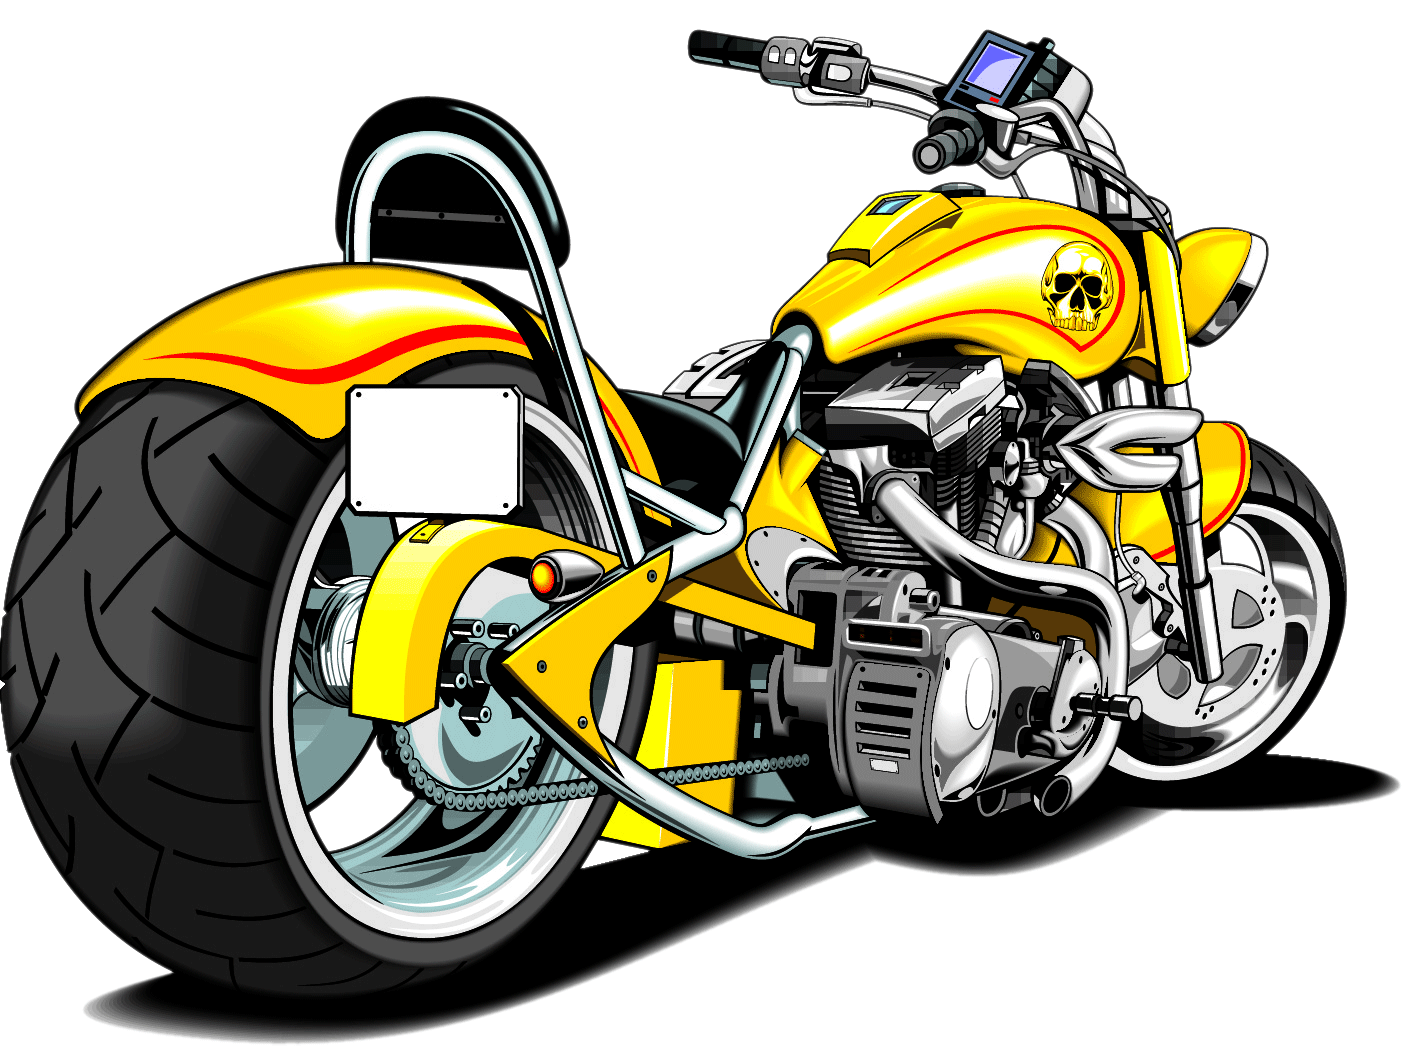 1404x1047 Harley Davidson Png Images Free Download